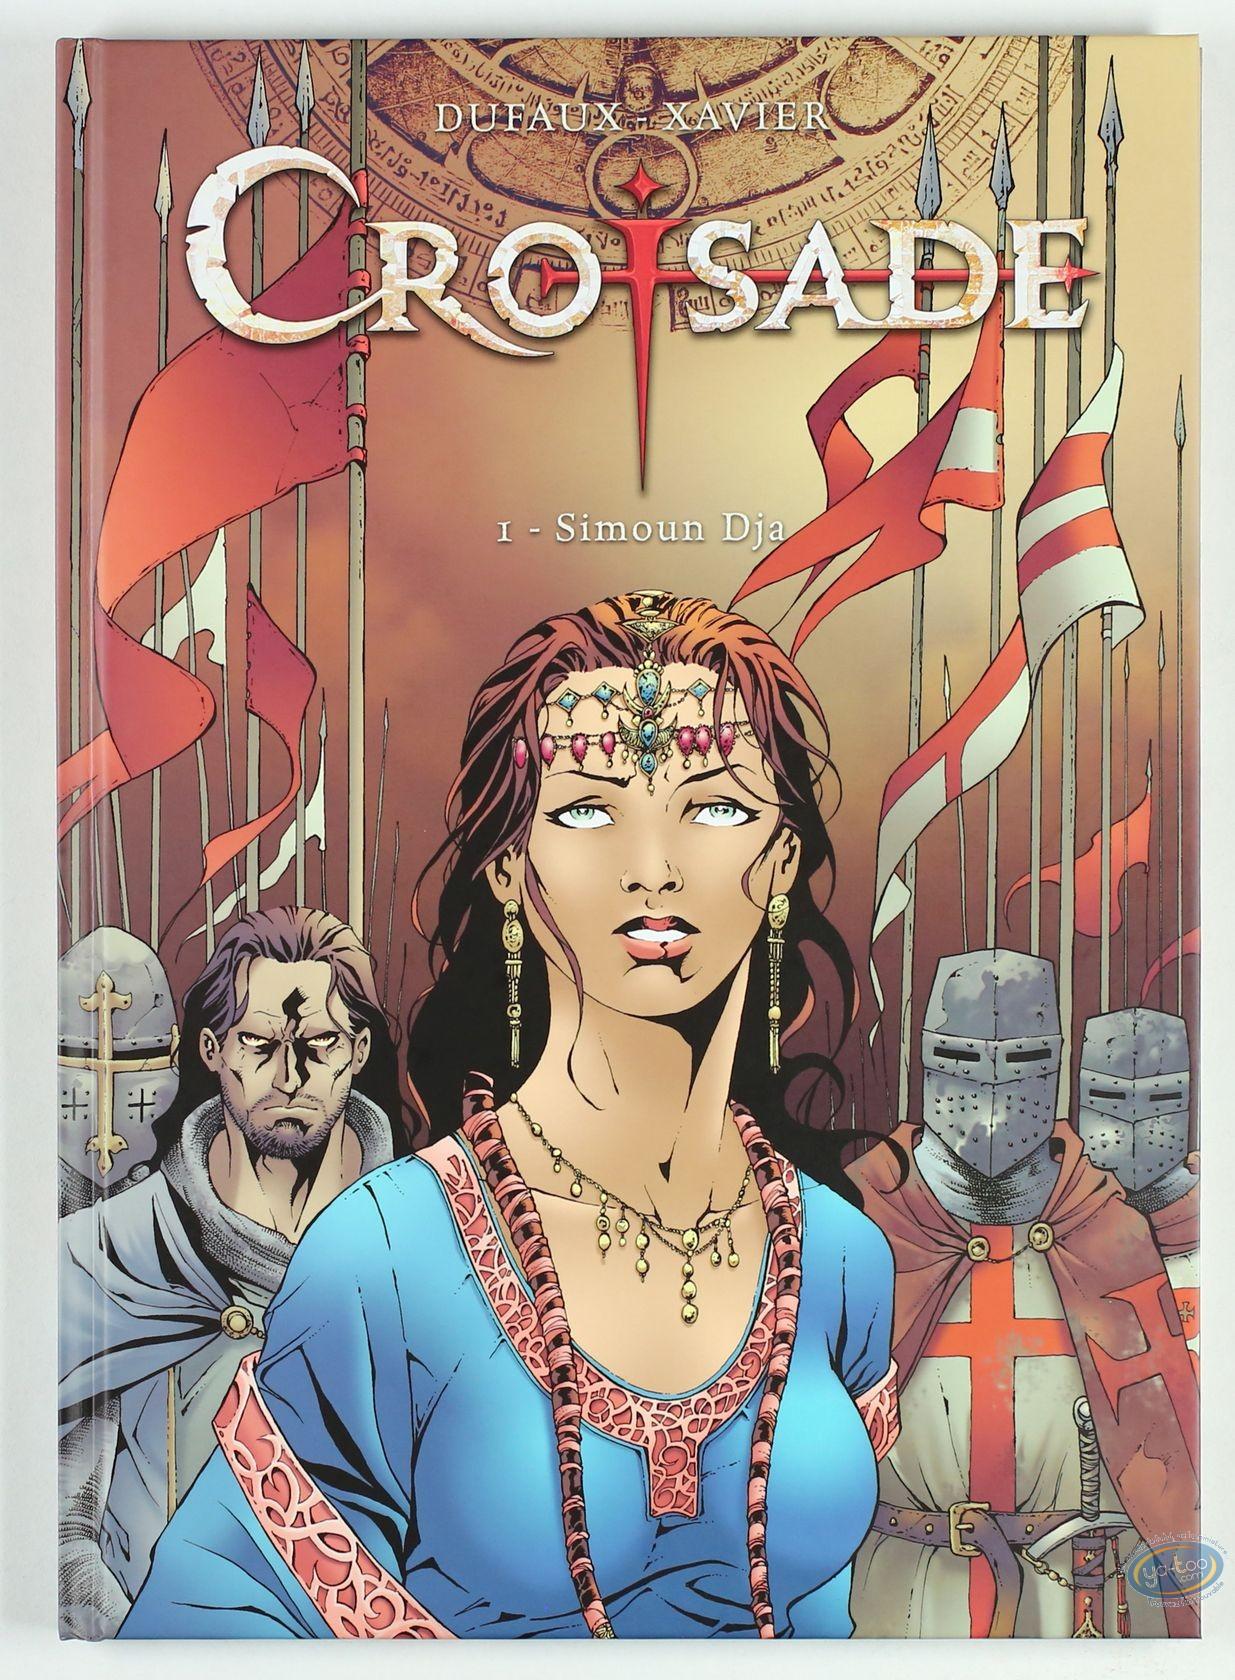 Tirage de tête, Croisades : Simoun Dja